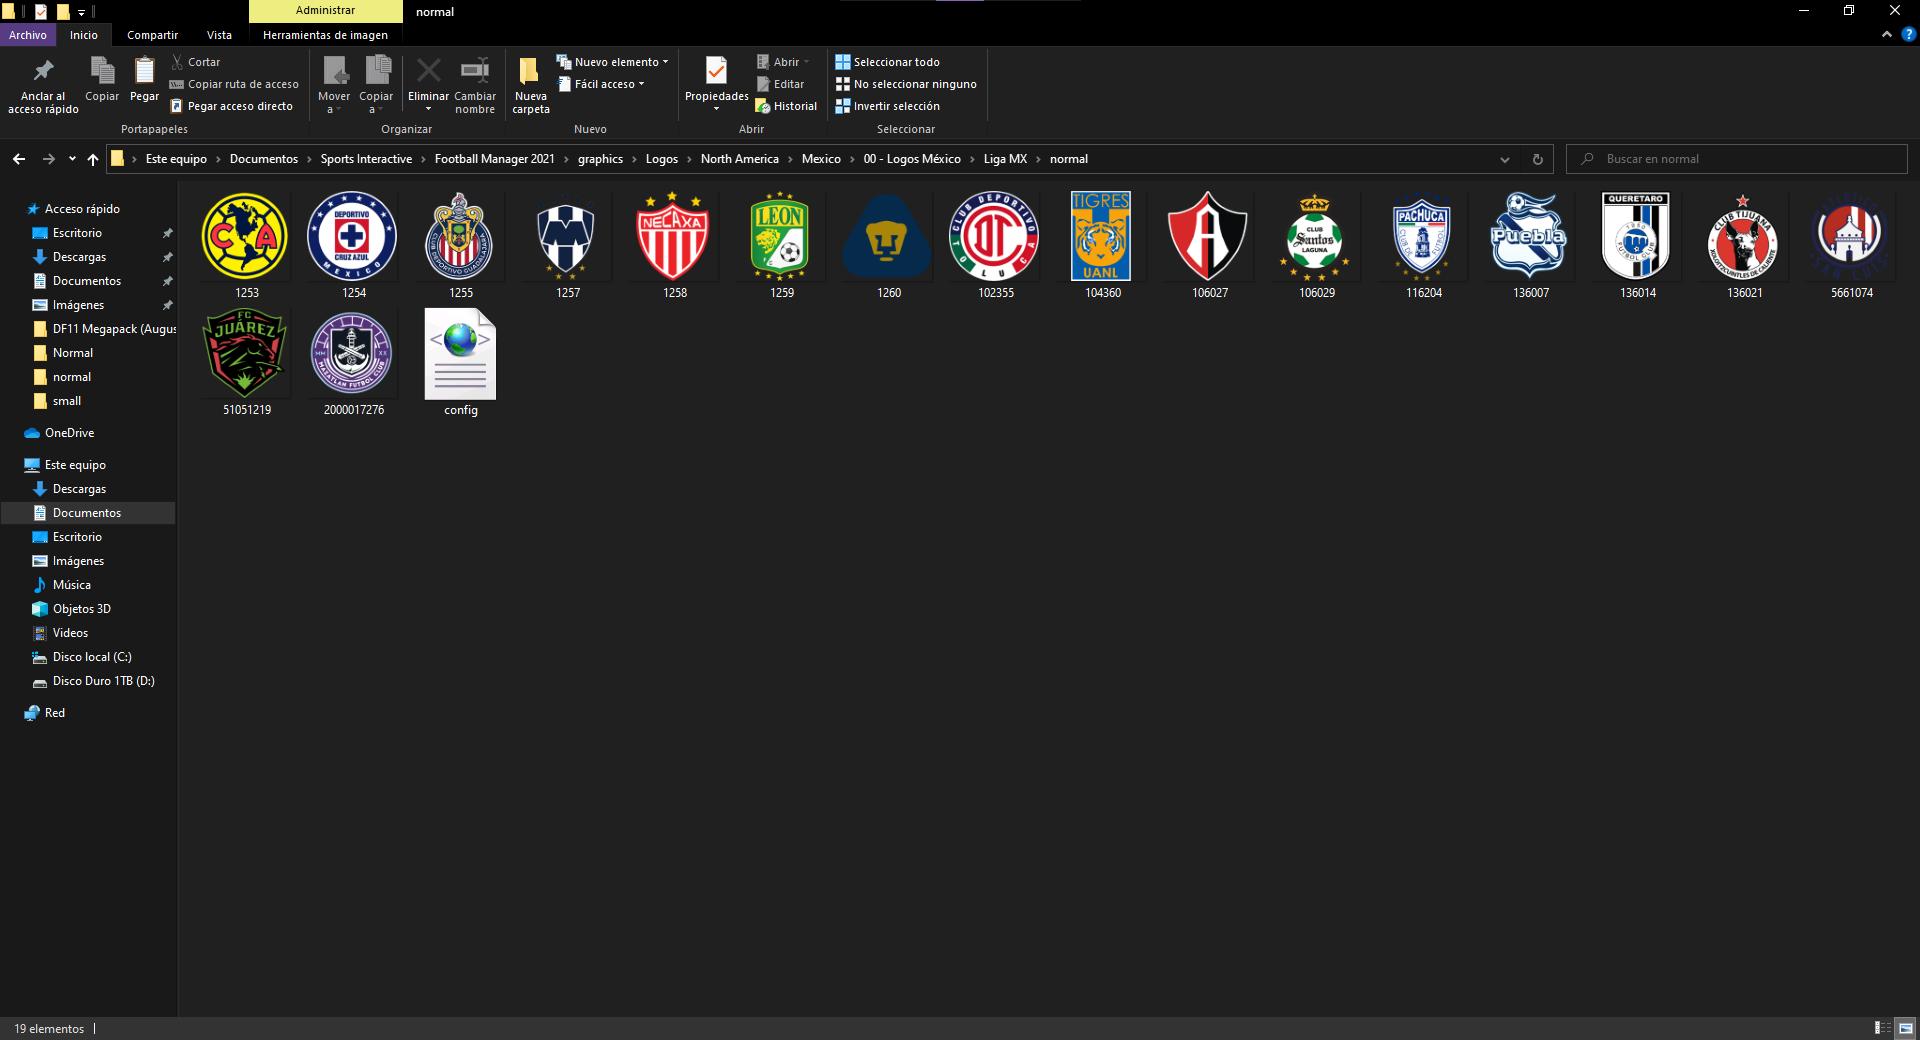 Logos Liga MX y Liga Expansión